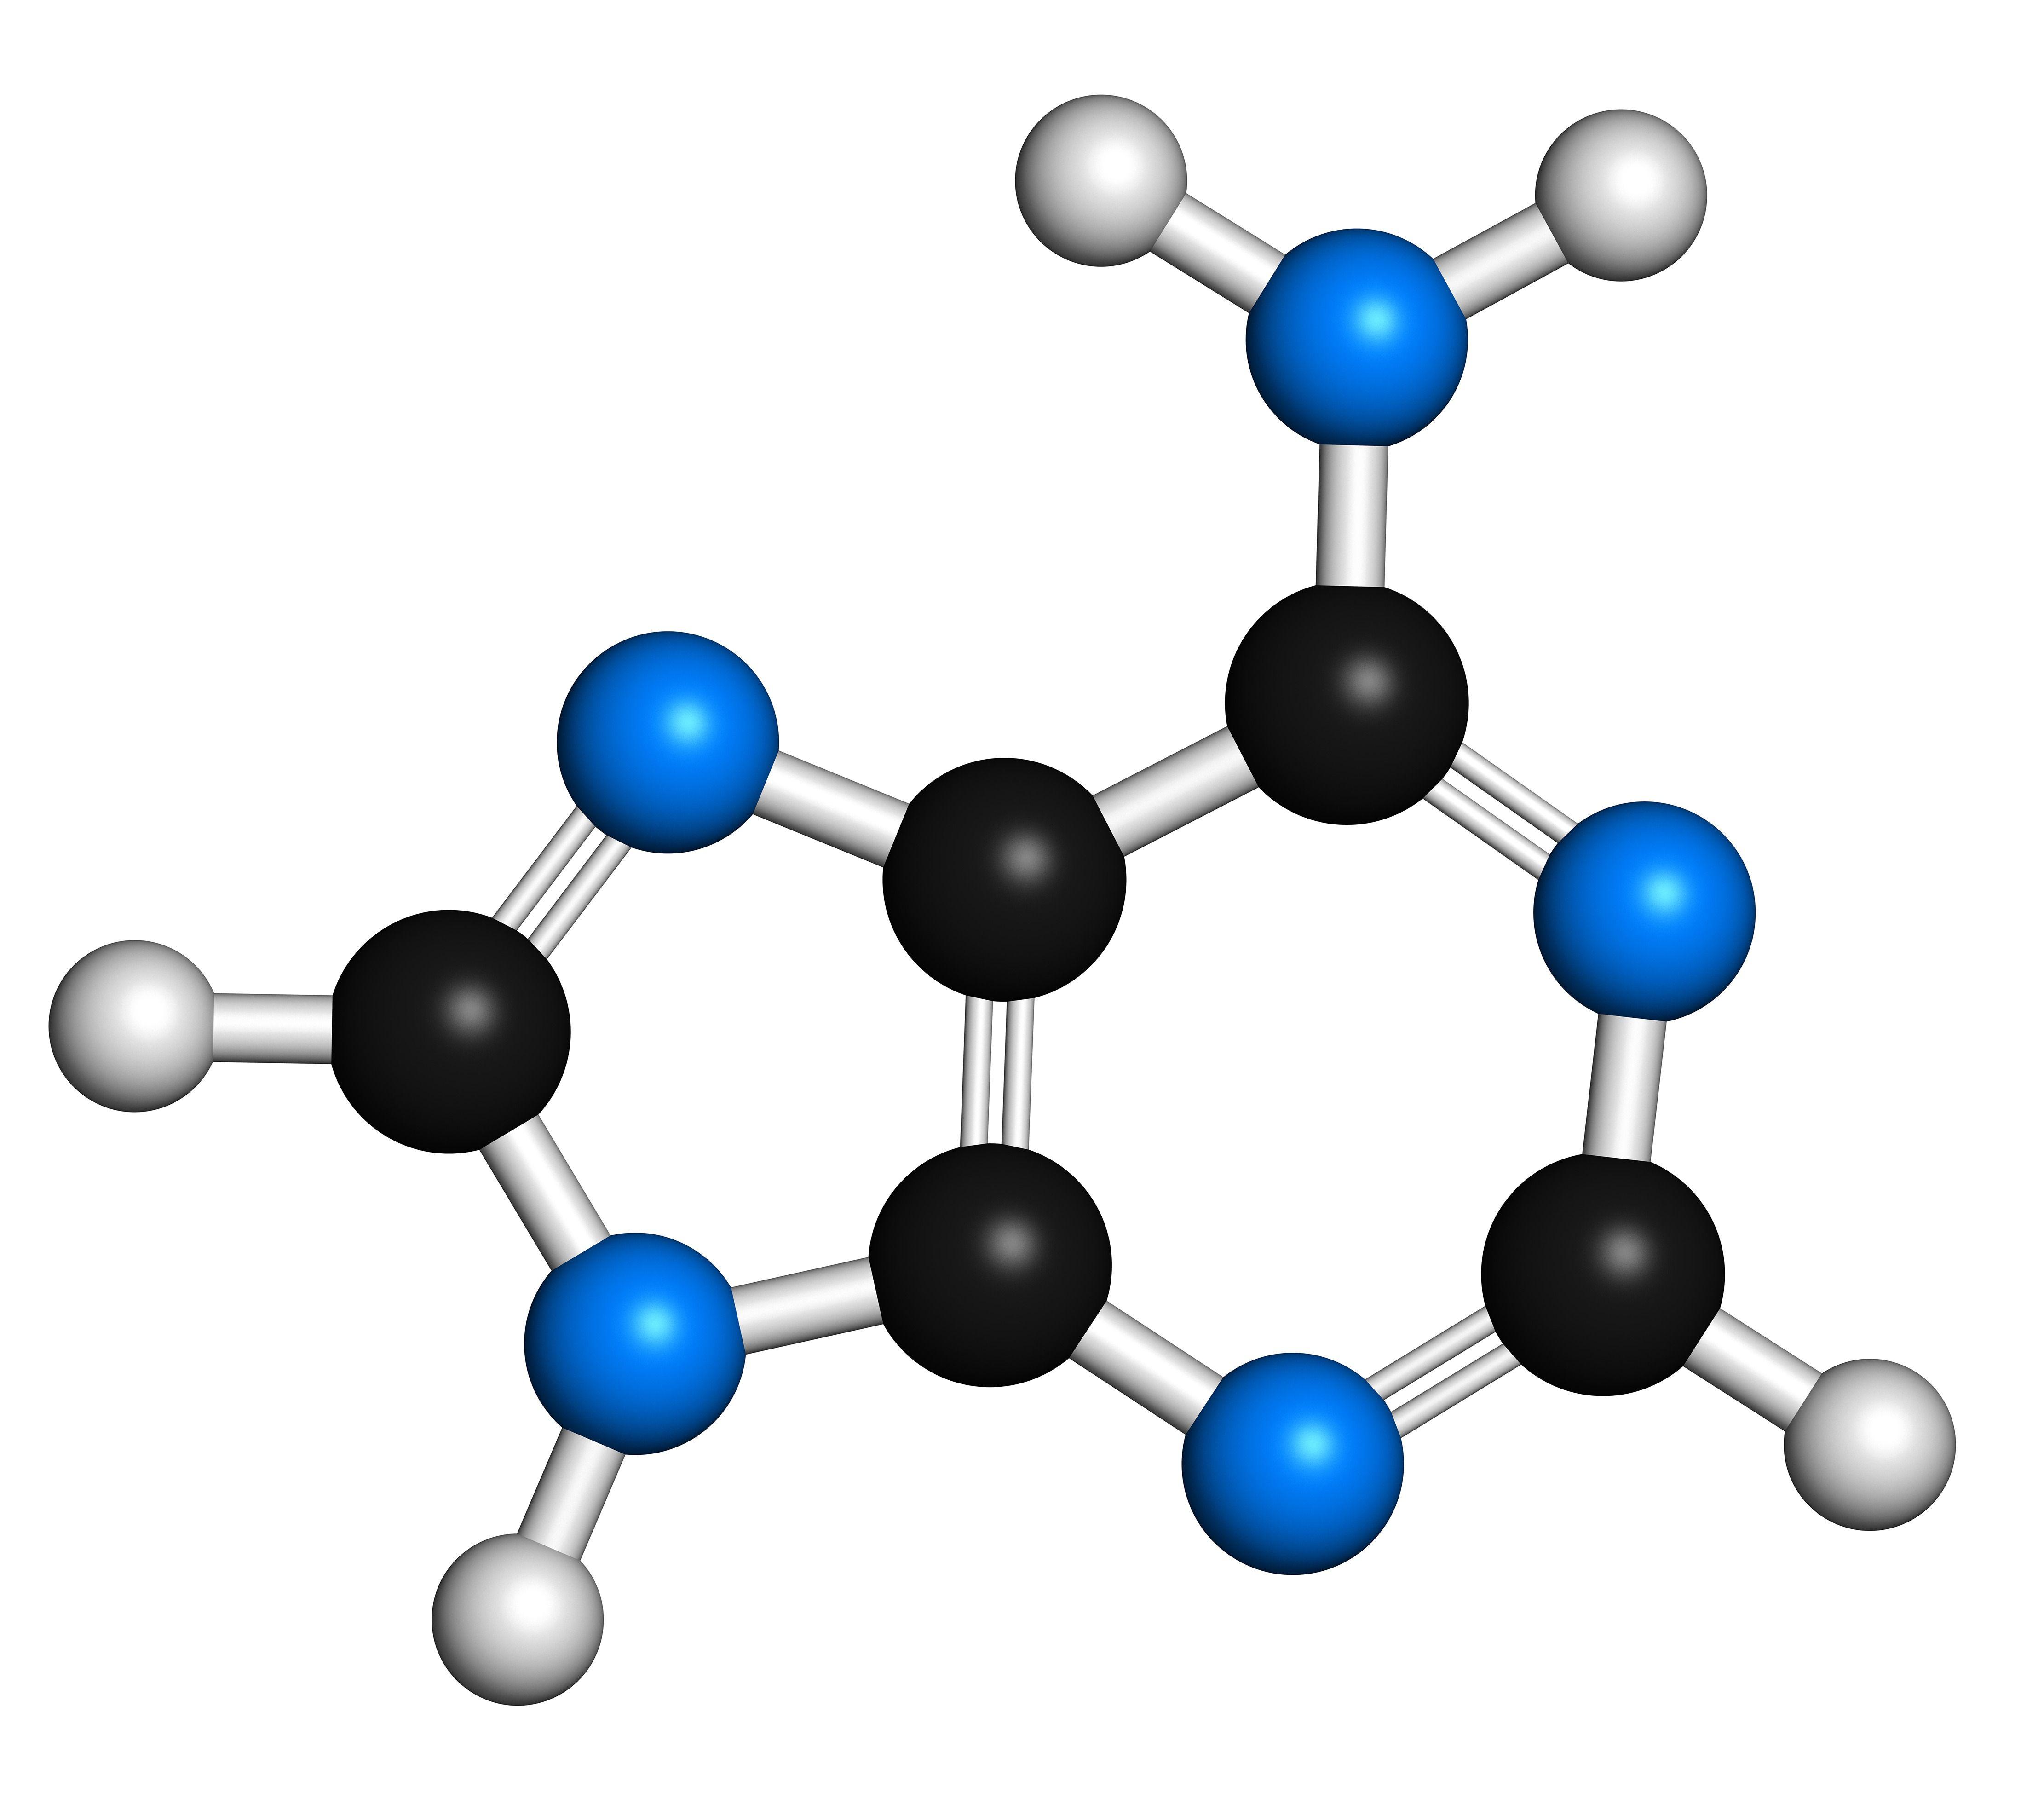 Adenine purine nitrogen base molecule